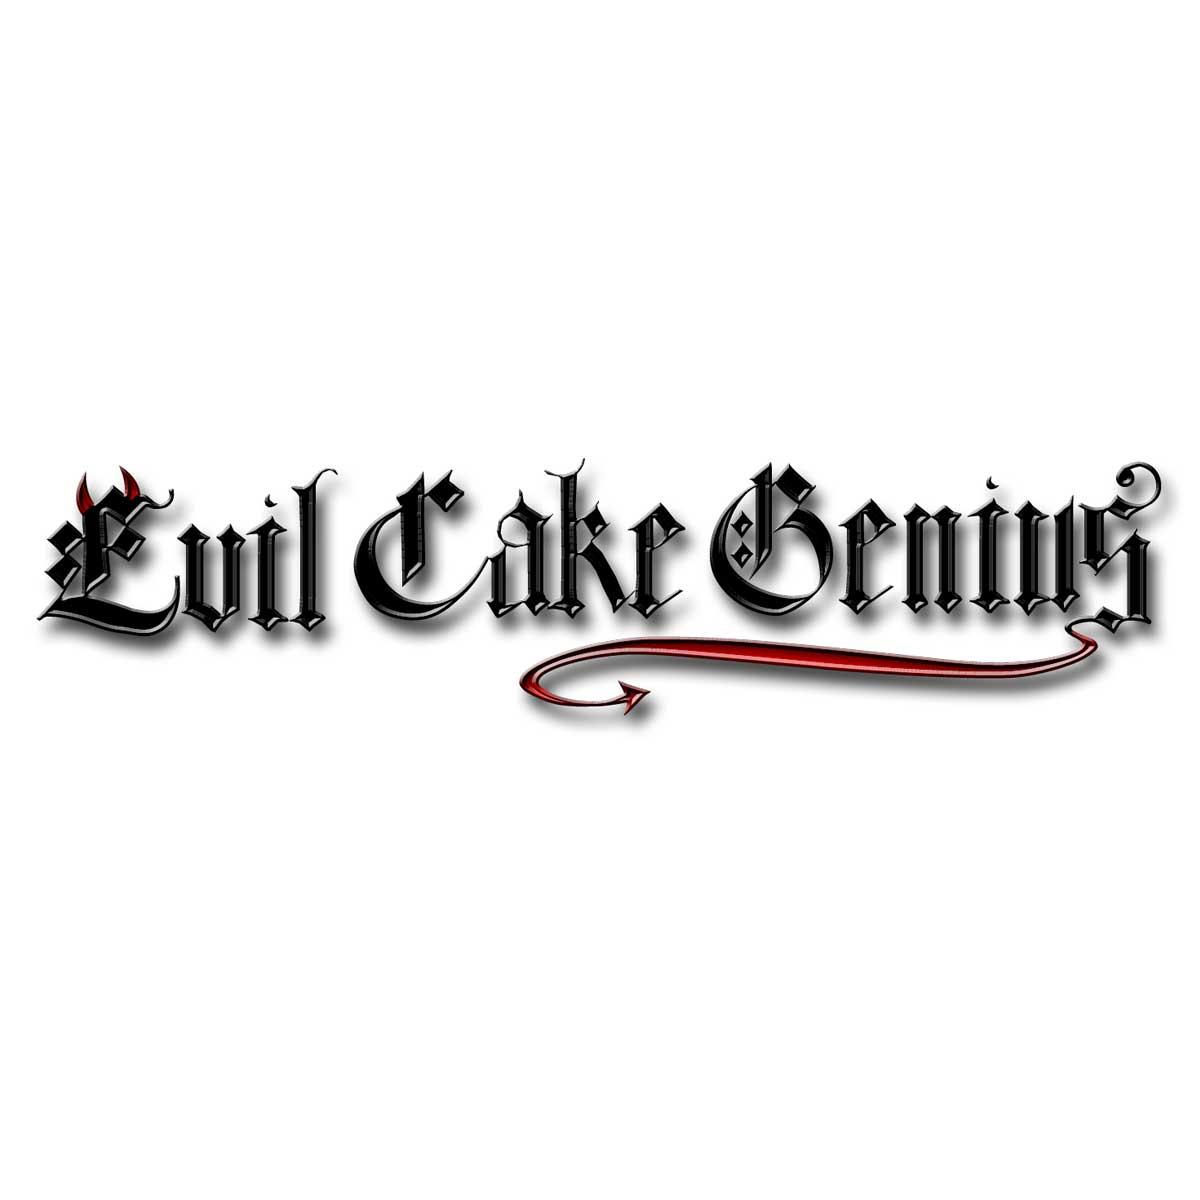 Crystal Candy Cake Flakes Bridal Shine 6 Grams